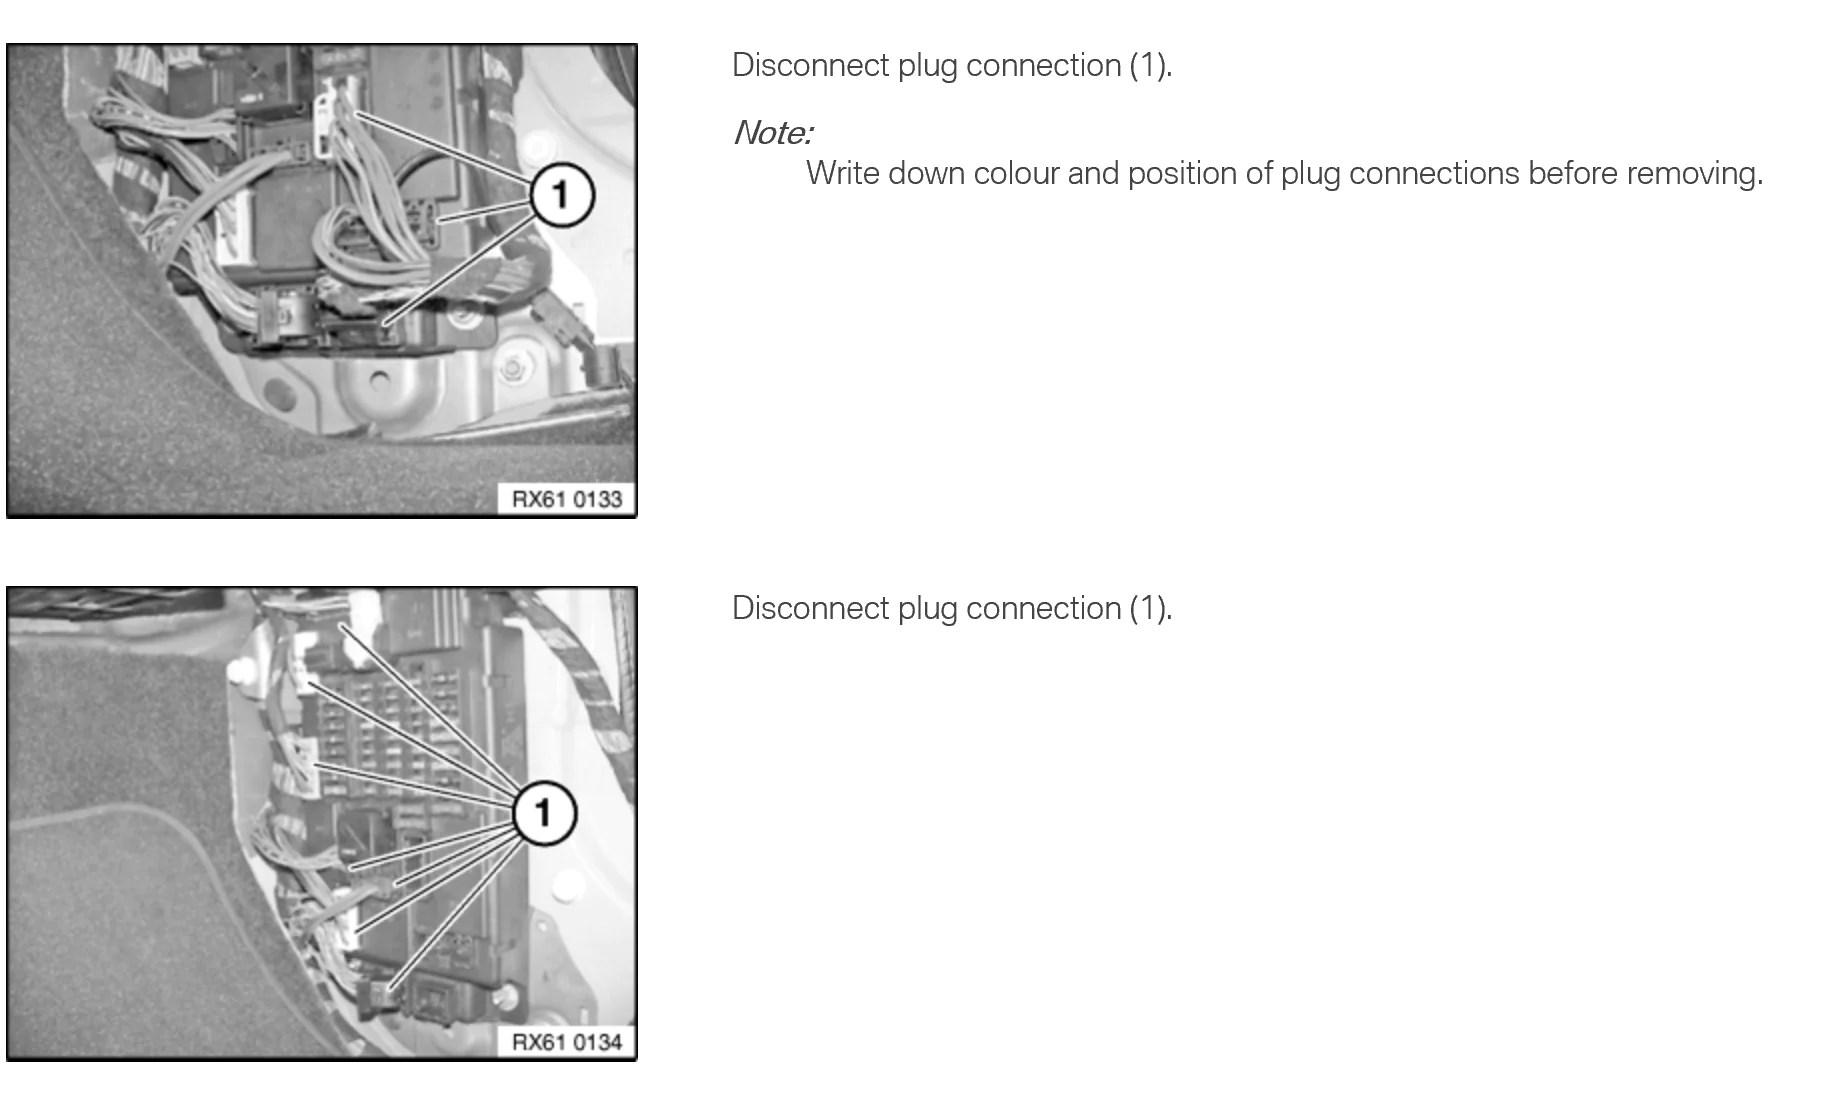 hight resolution of mini cooper r56 r58 r60 all r series fuse box speg removal fuse box removal 2003 malibu fuse box removal